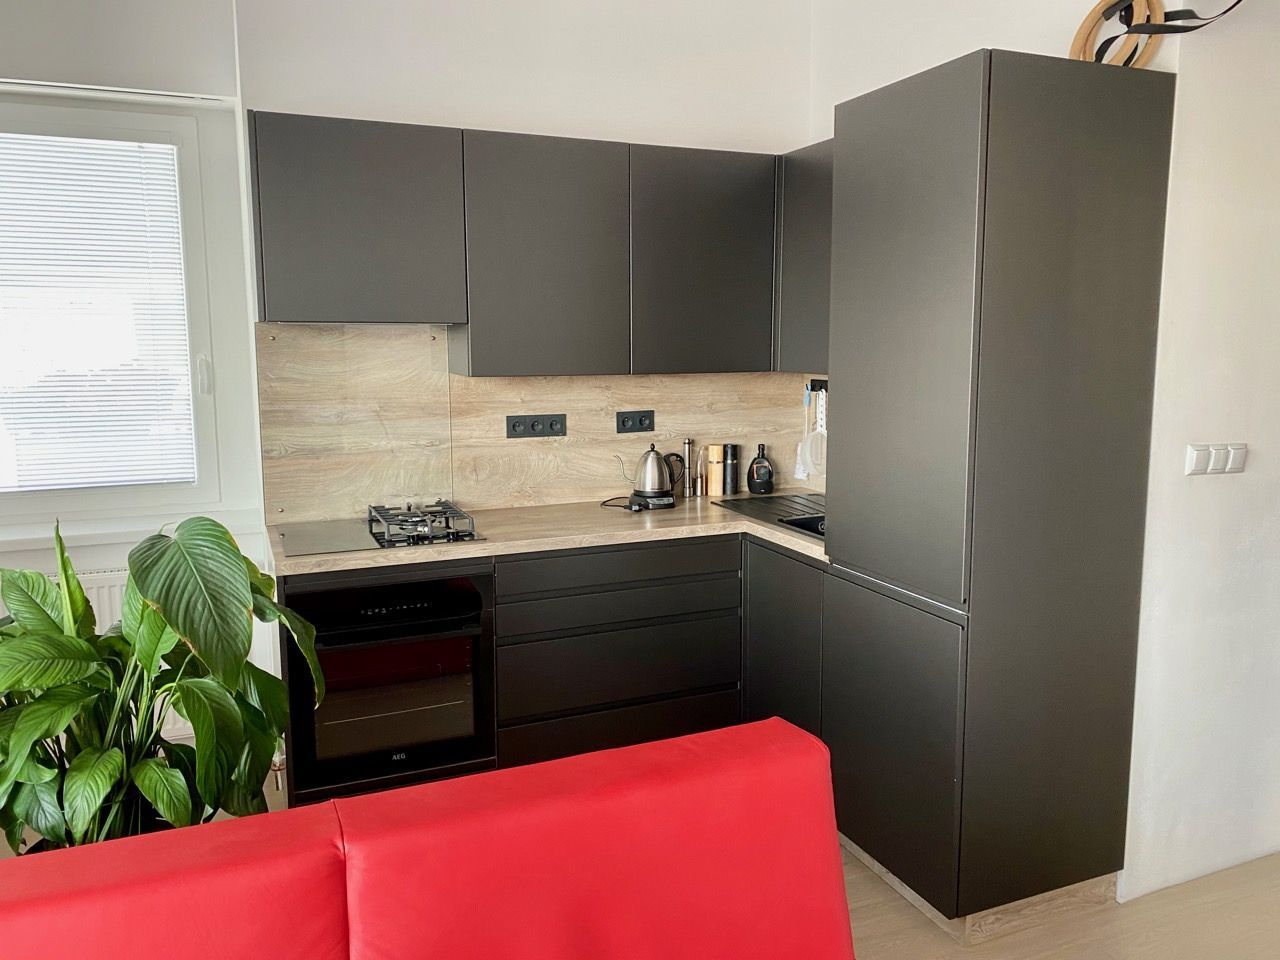 2-izbový byt-Predaj-Biely Kostol-99 000 €